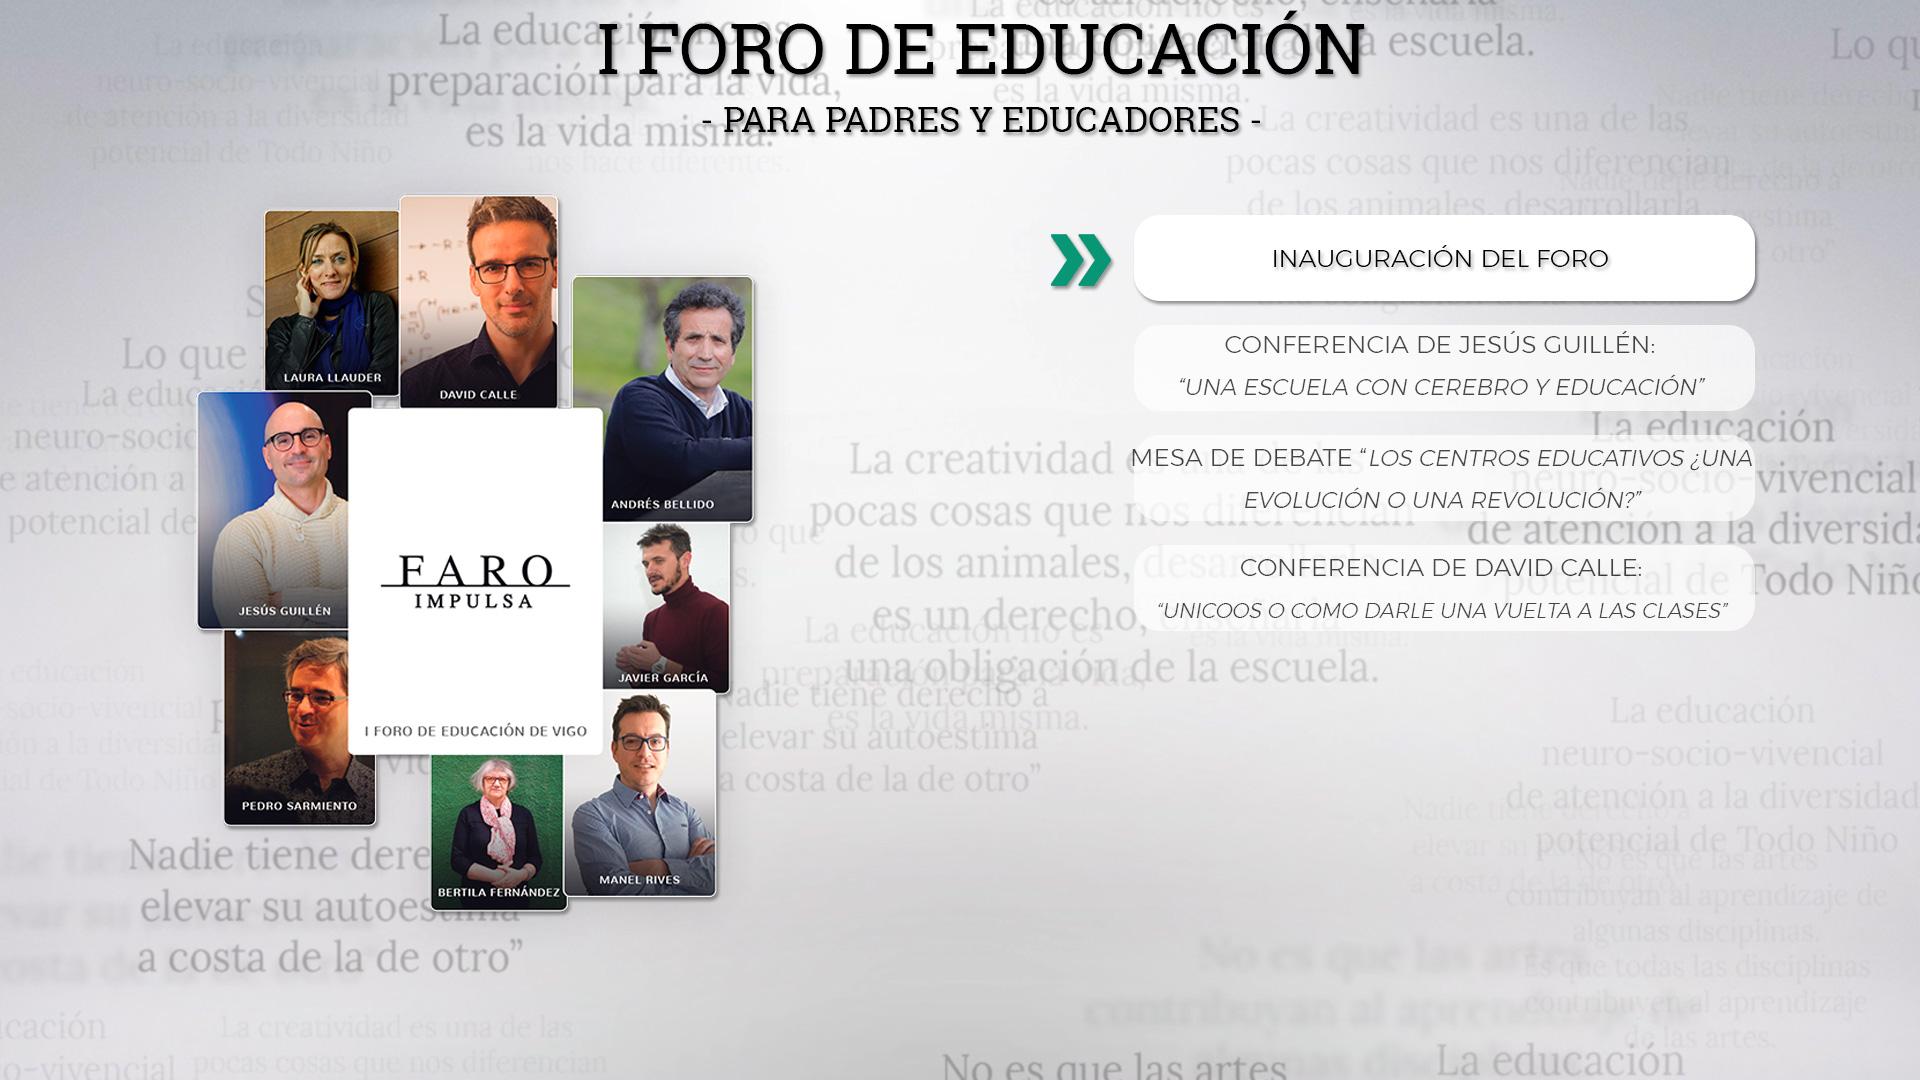 I Foro de Educación Faro Impulsa en Vigo